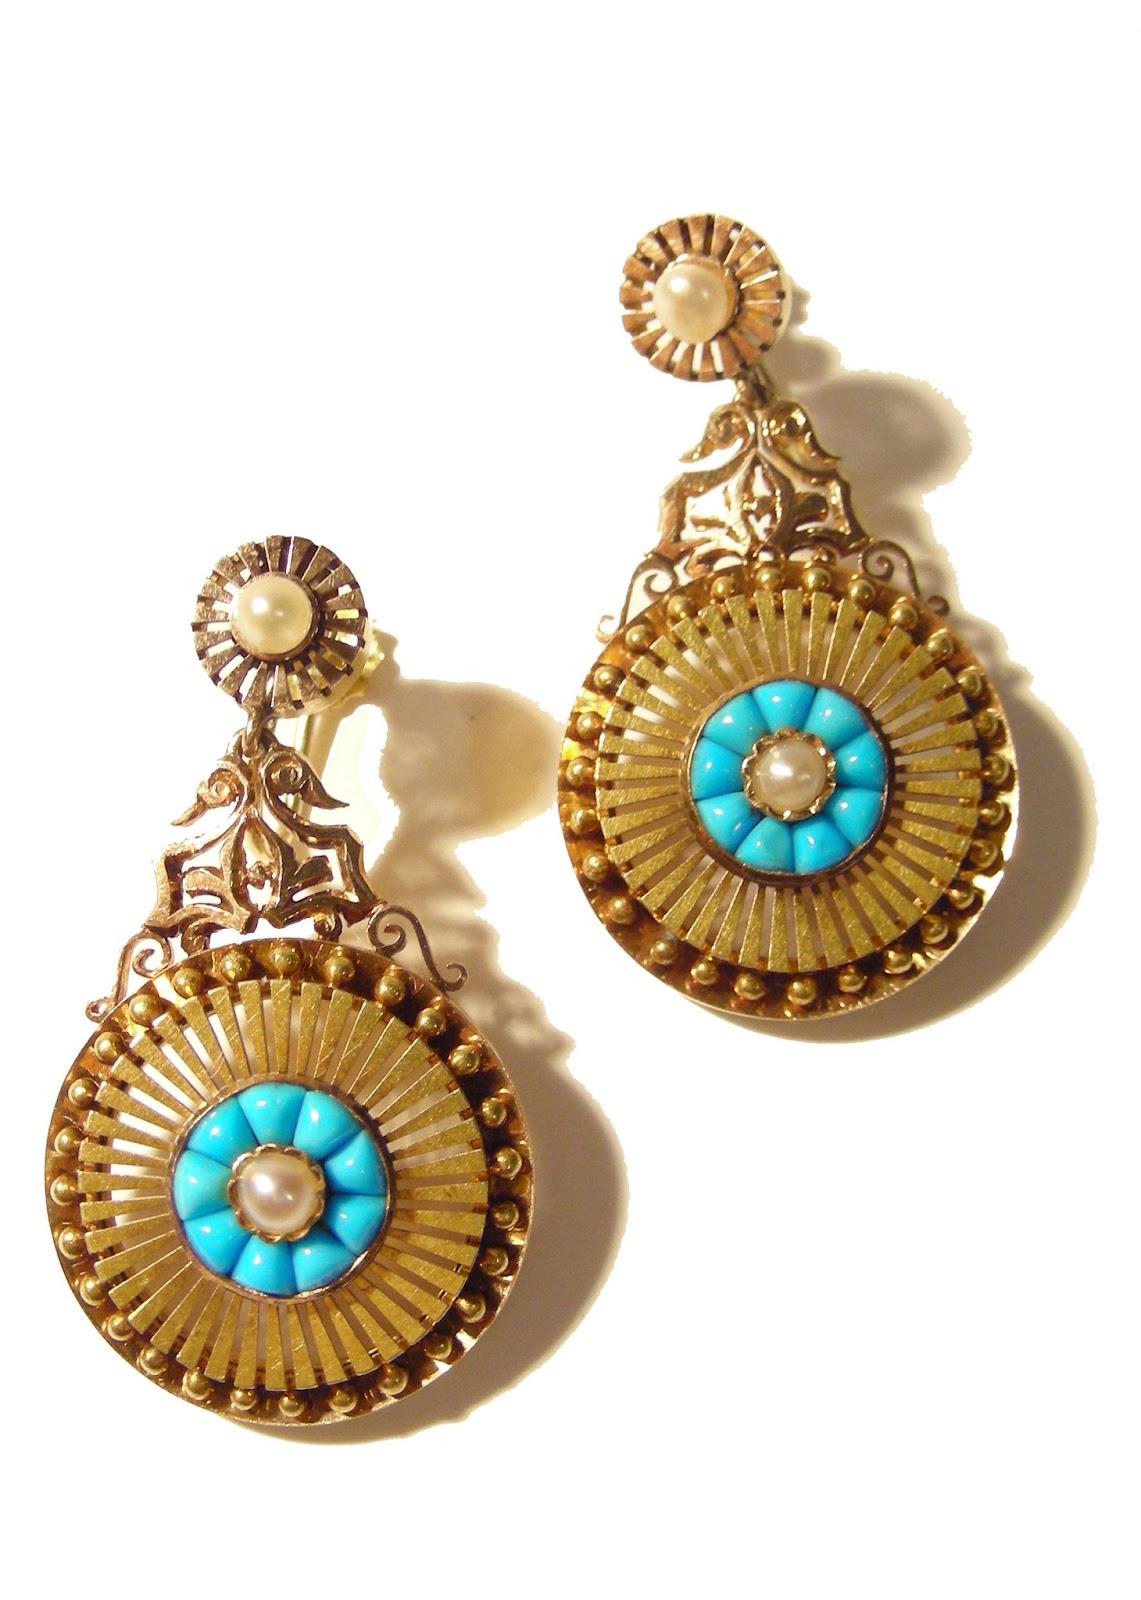 Latest Design of Gold Earrings - Latest Design Updates